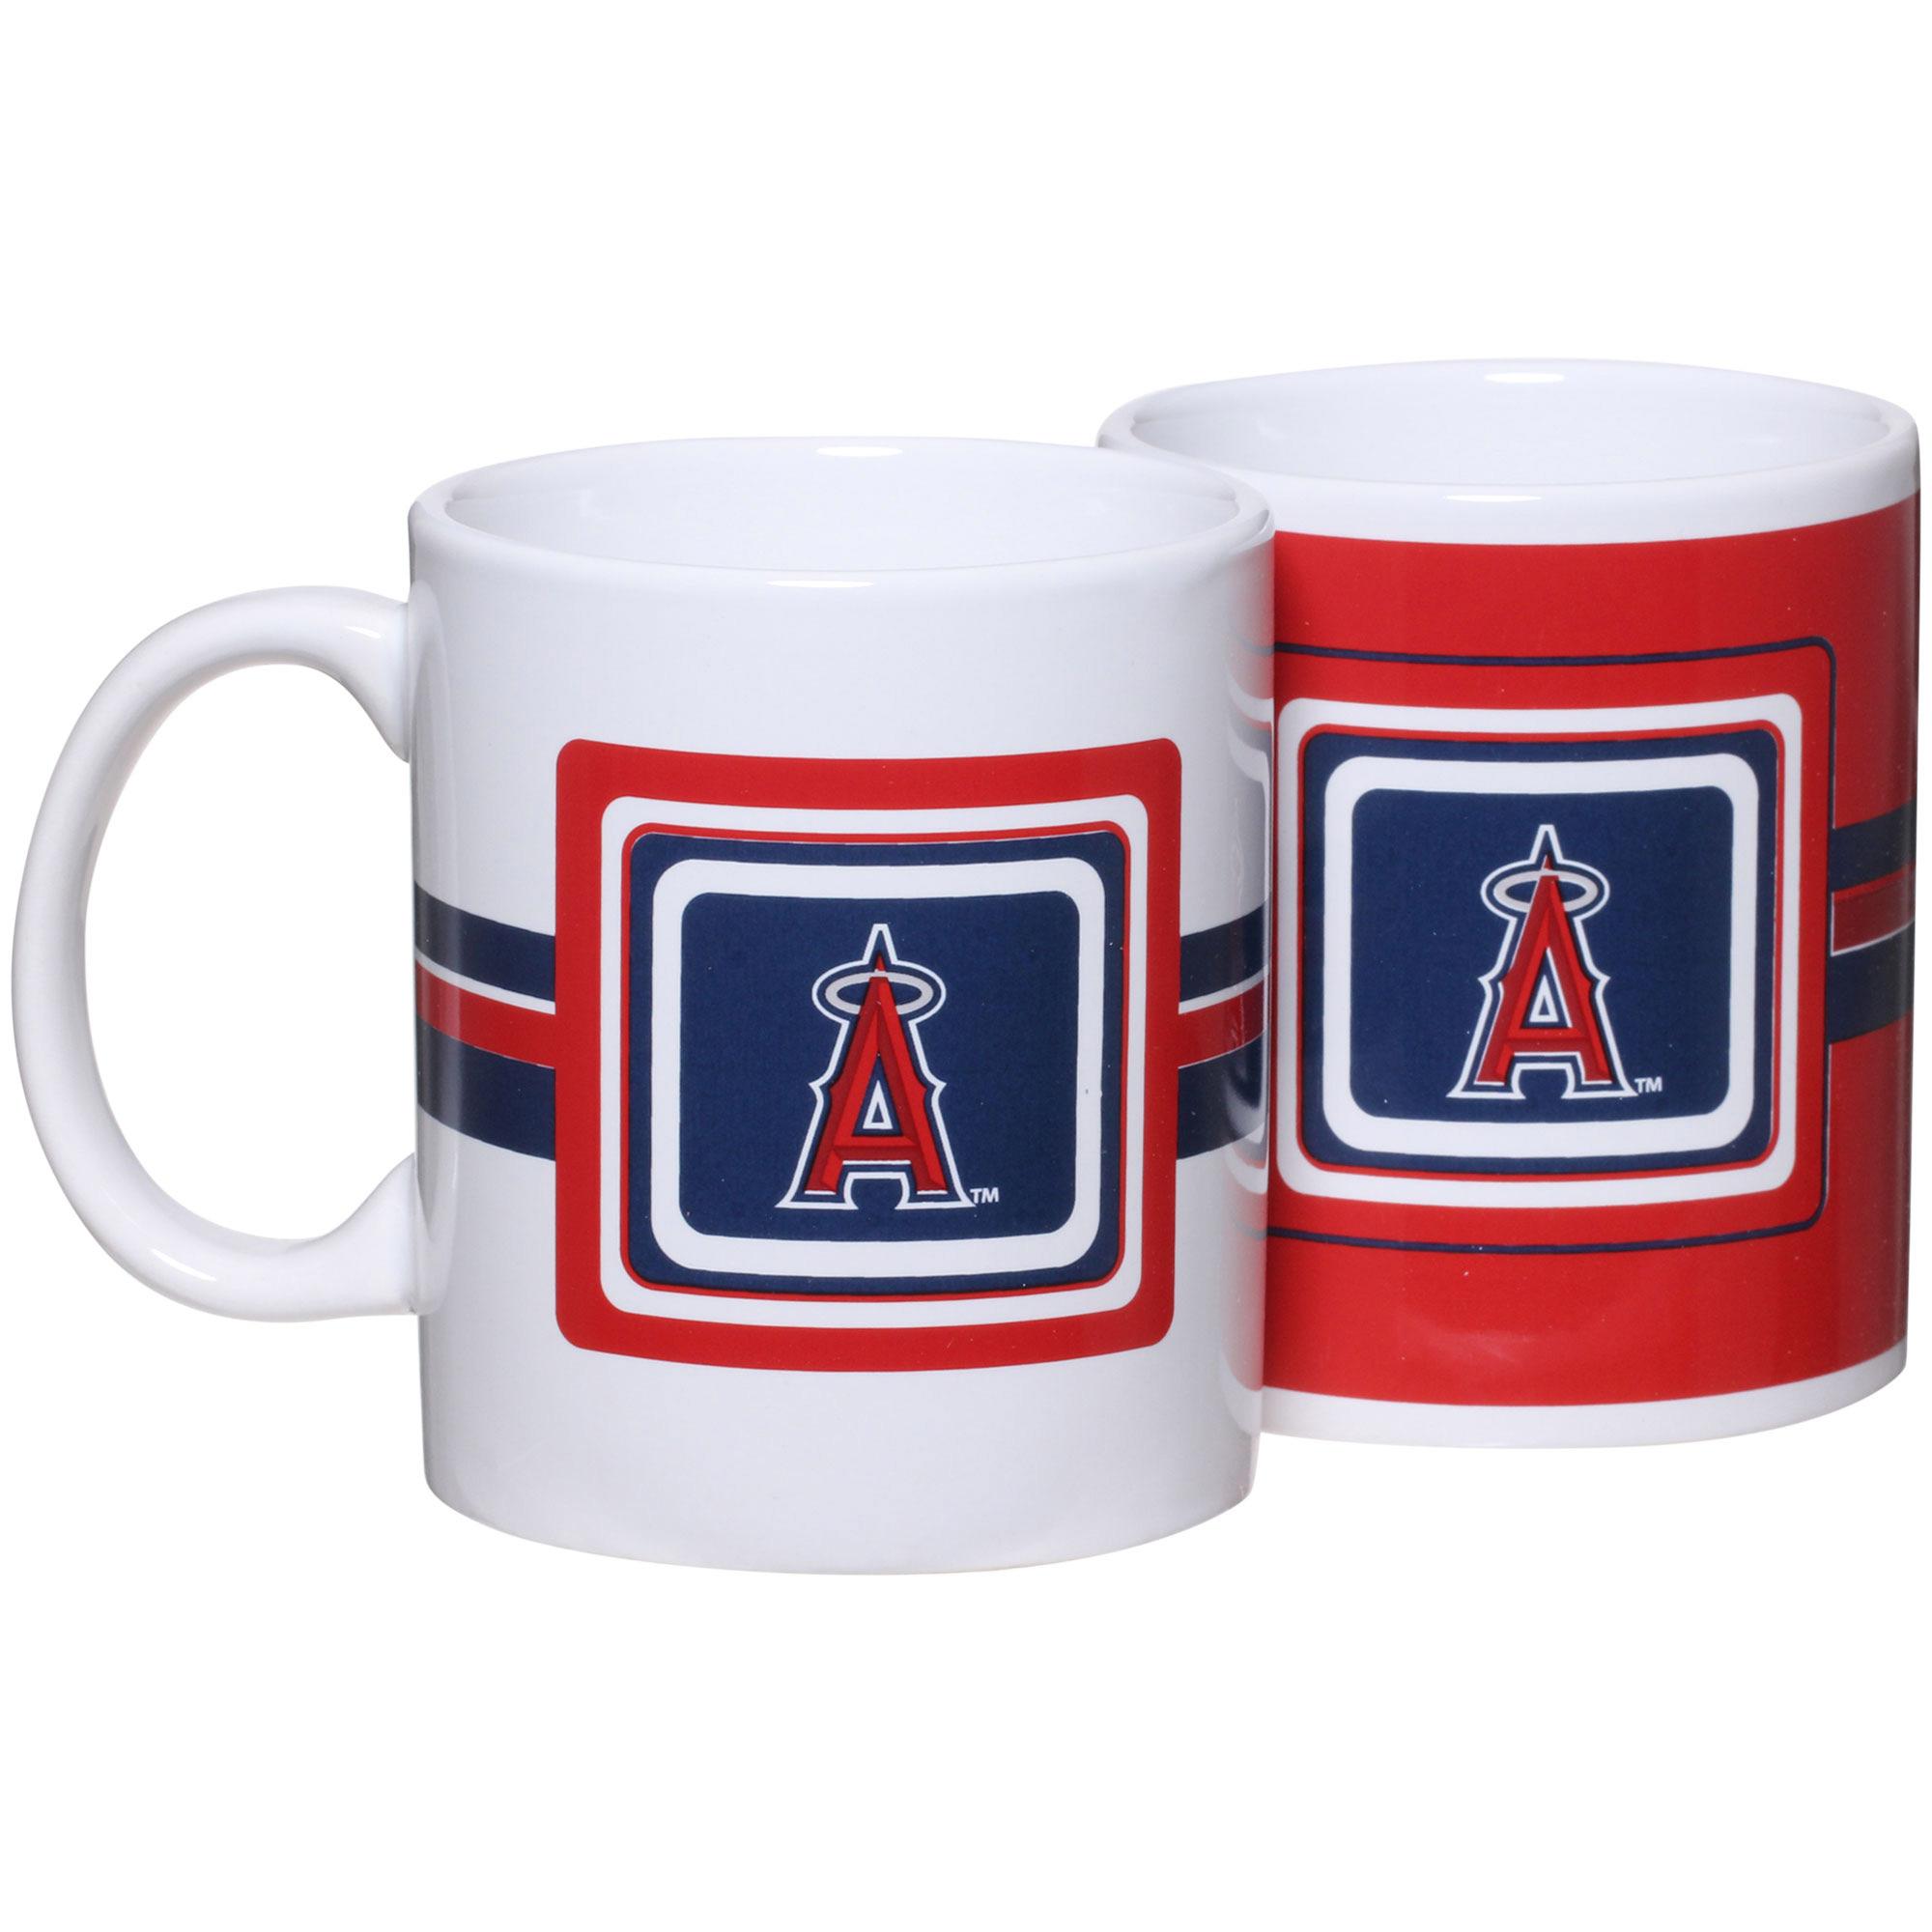 Los Angeles Angels 11oz. Two-Pack Mug Set - No Size